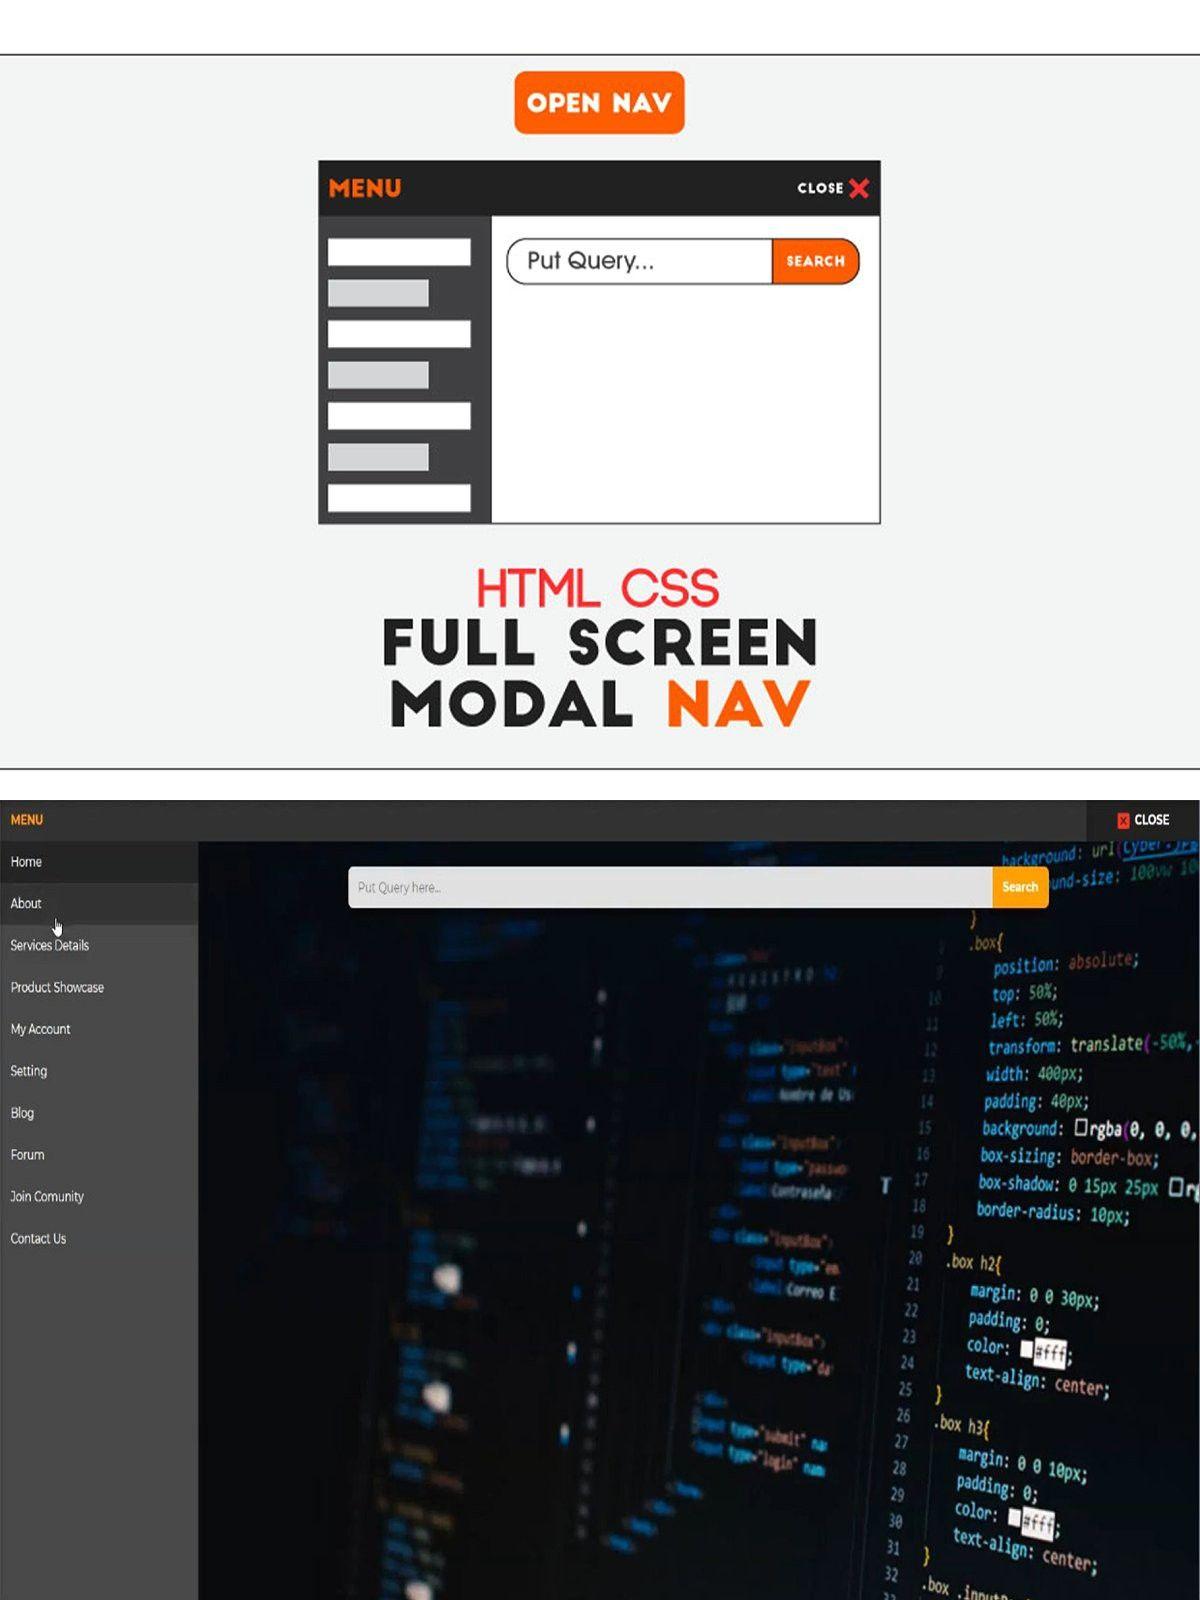 Full Screen Modal Nav, Pure HTML in 2020 Web graphic